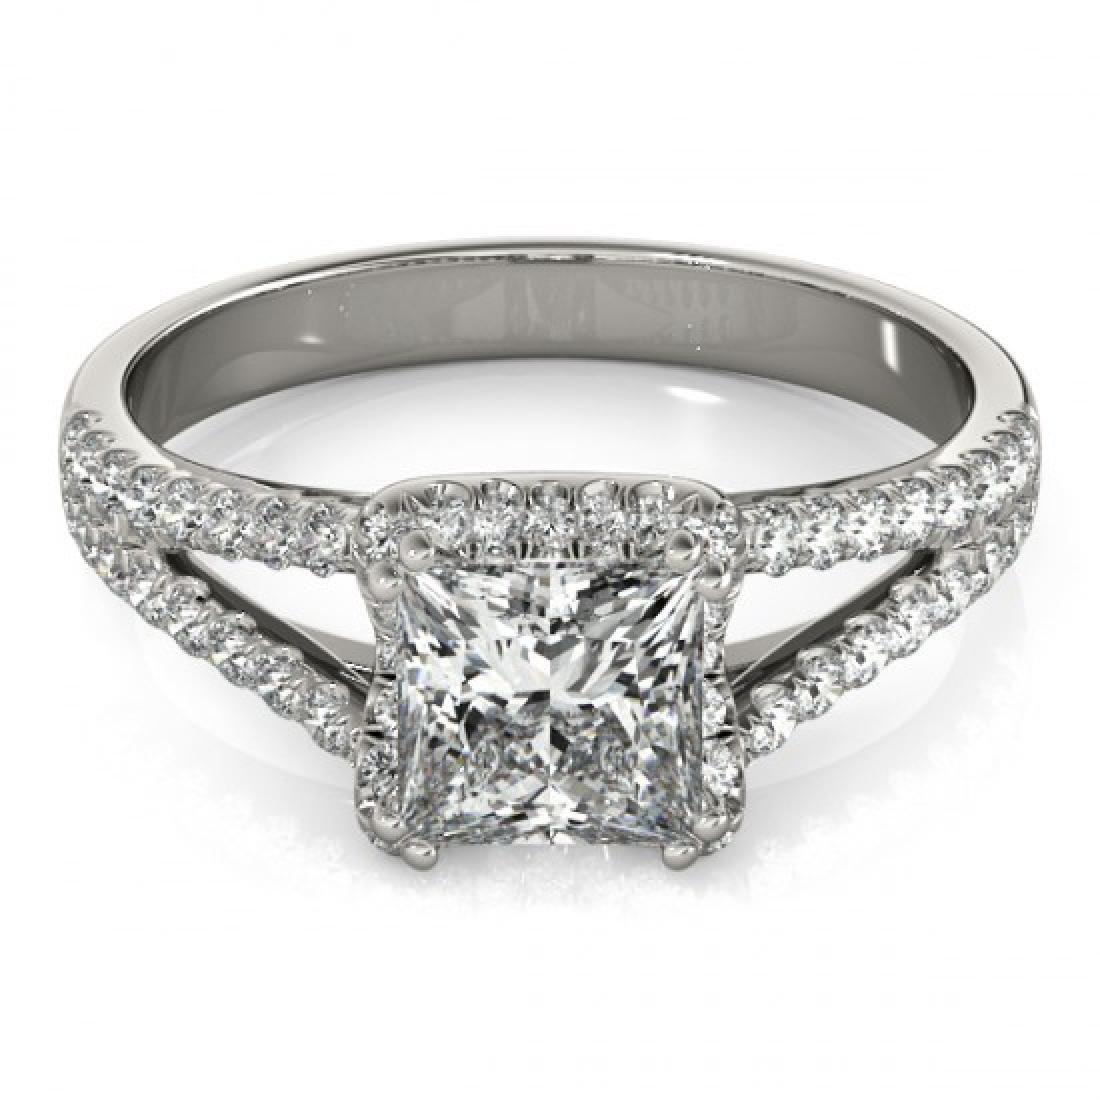 2.05 CTW Certified VS/SI Princess Diamond Solitaire